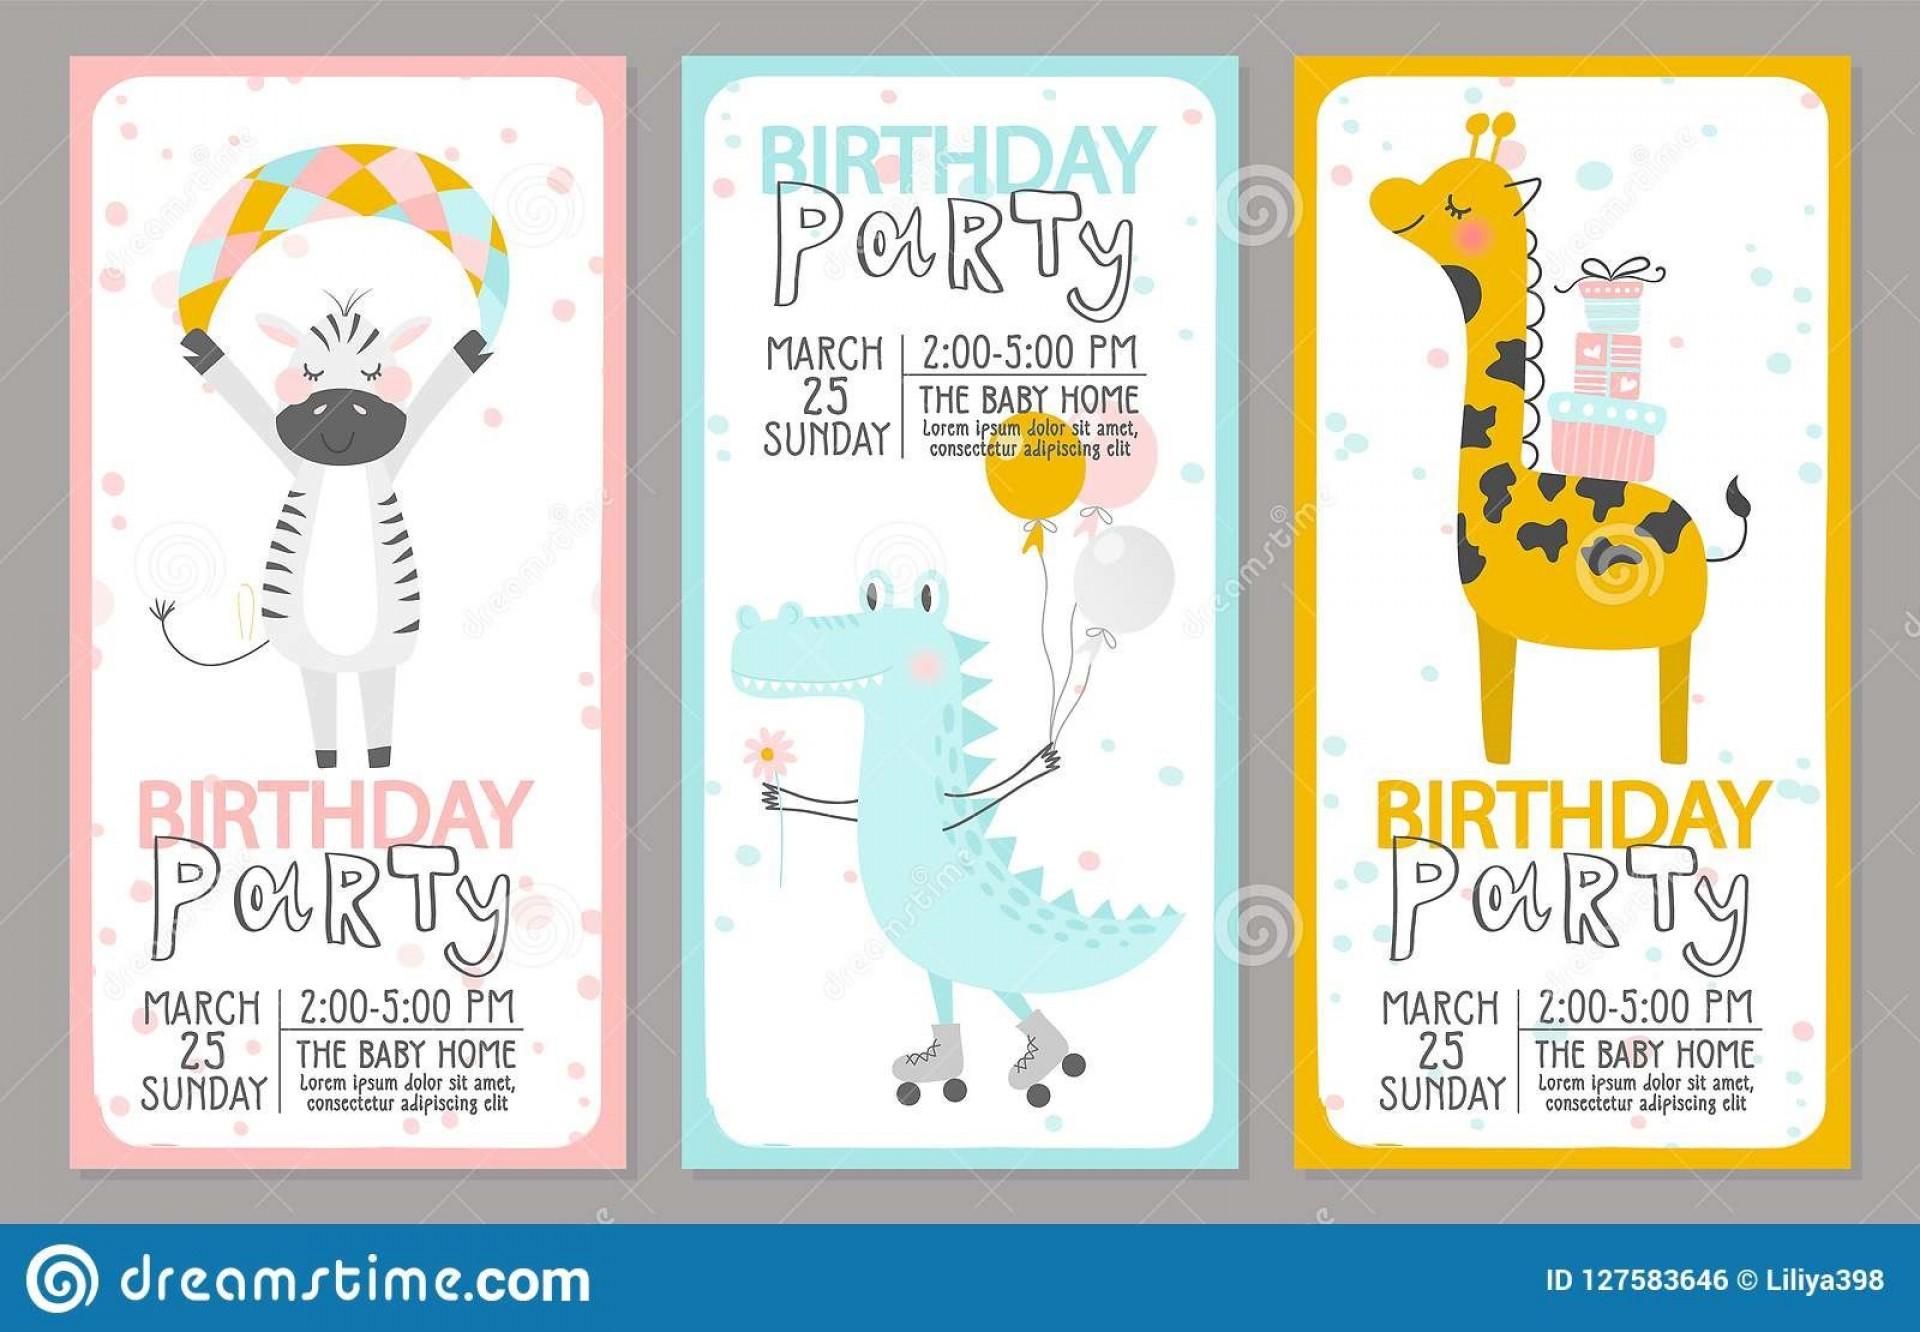 008 Striking Free Birthday Party Invitation Template Photo  Templates Printable 16th Australia Uk1920